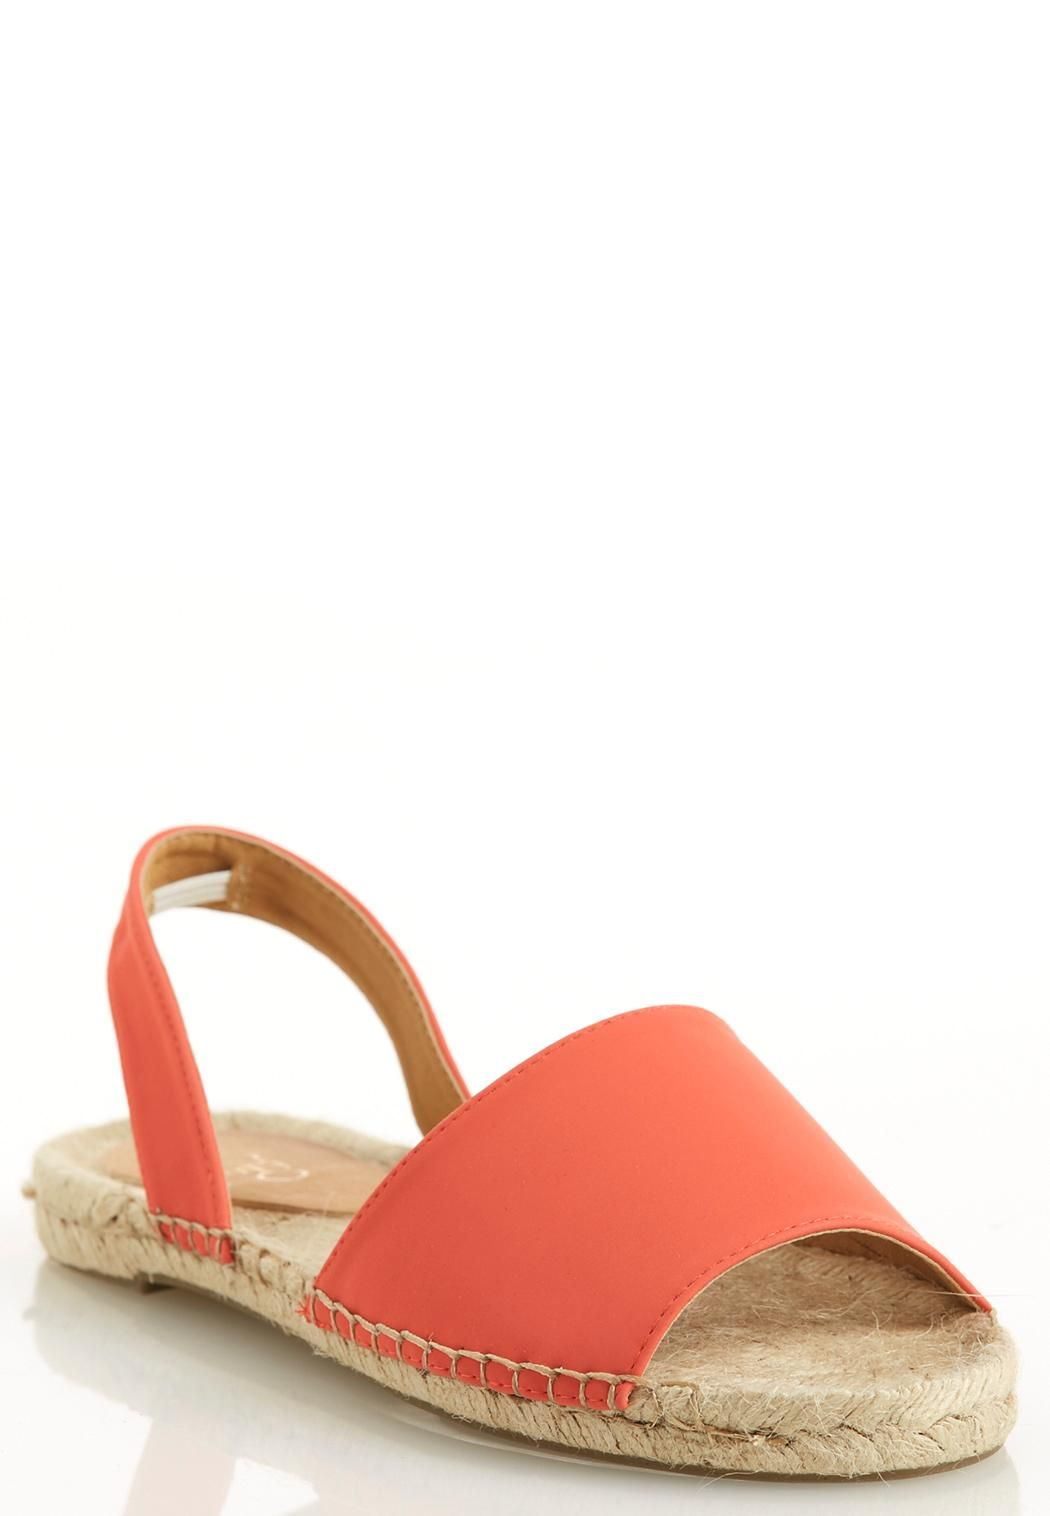 dccfdbf3f Peep Toe Espadrille Sandals Flats #CatoFashions | Cookout Classics ...